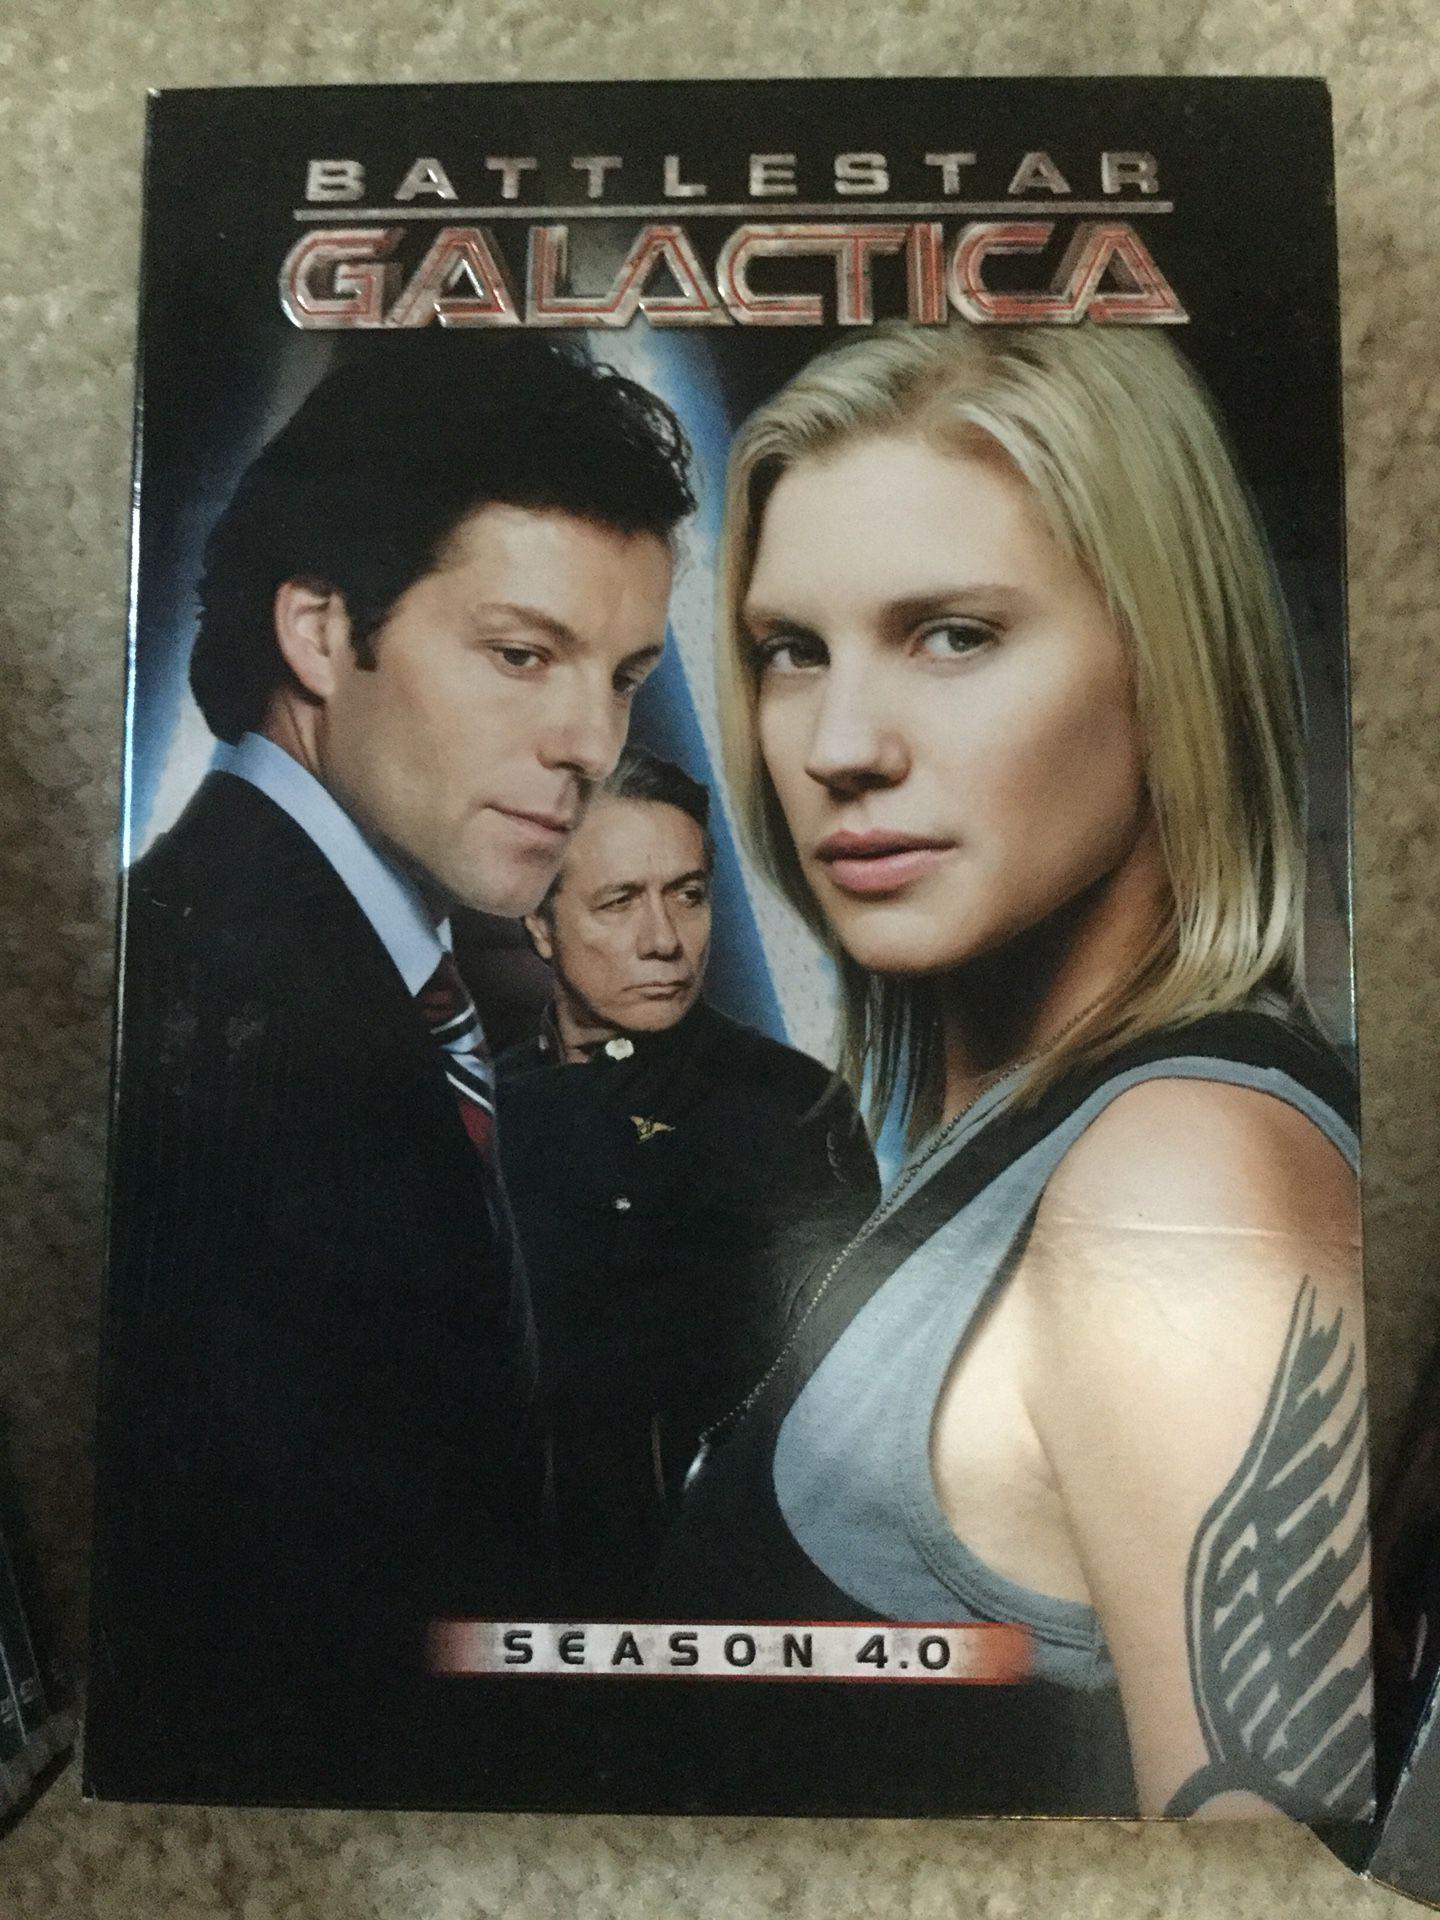 I have the complete Seasons for Battlestar Galactica from Season 1 -Season 4.5 😎👍🍿. 📀📀📀📀📀 🎥